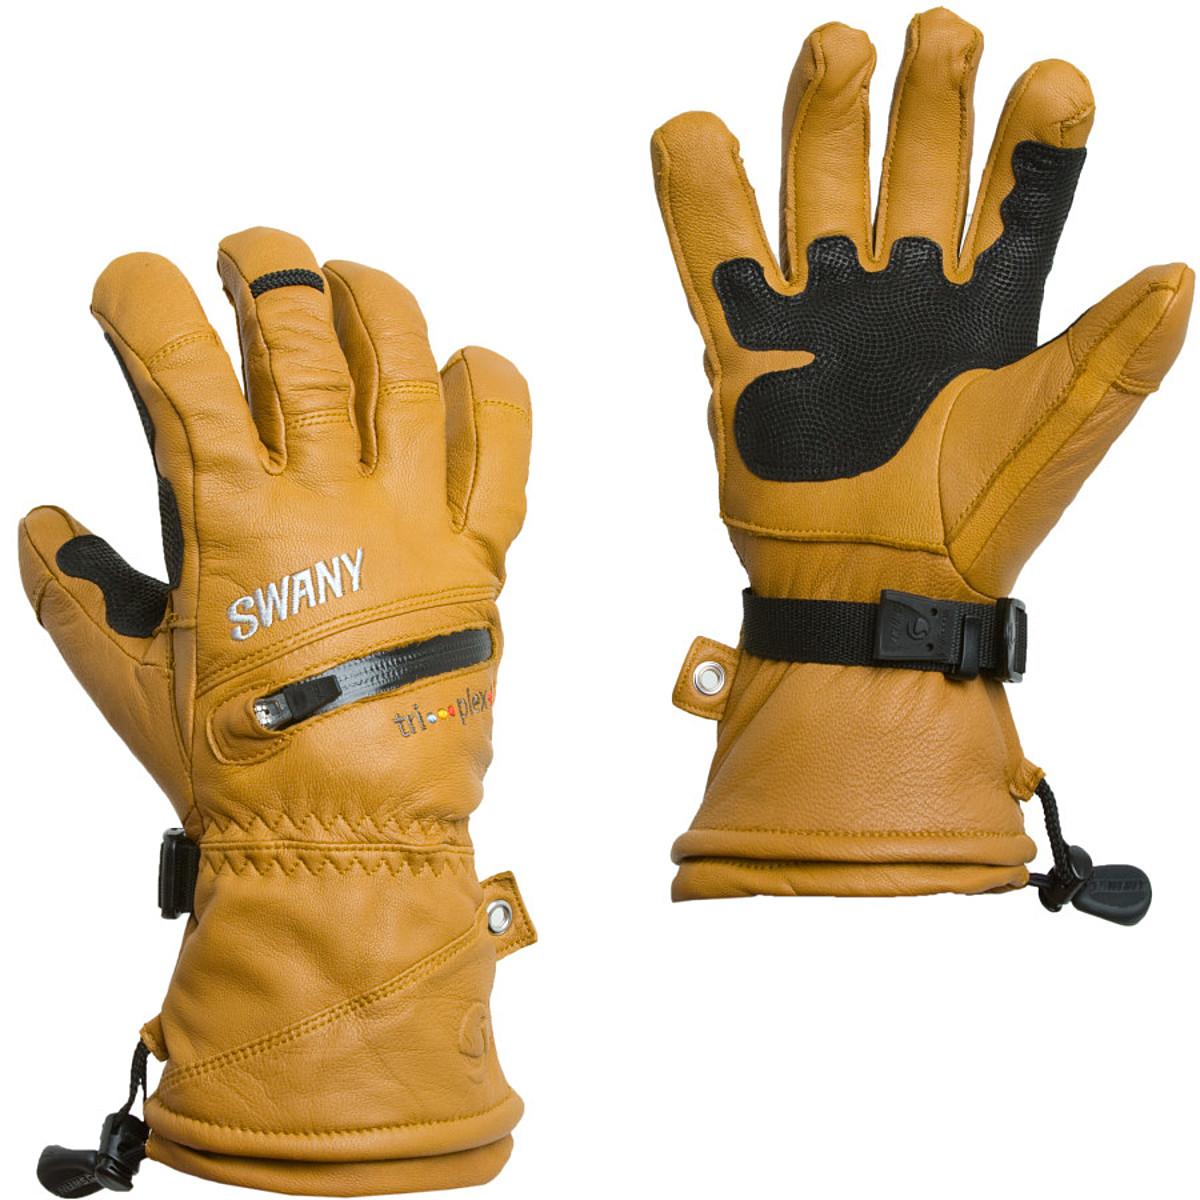 Swany X-Plode Ski Glove